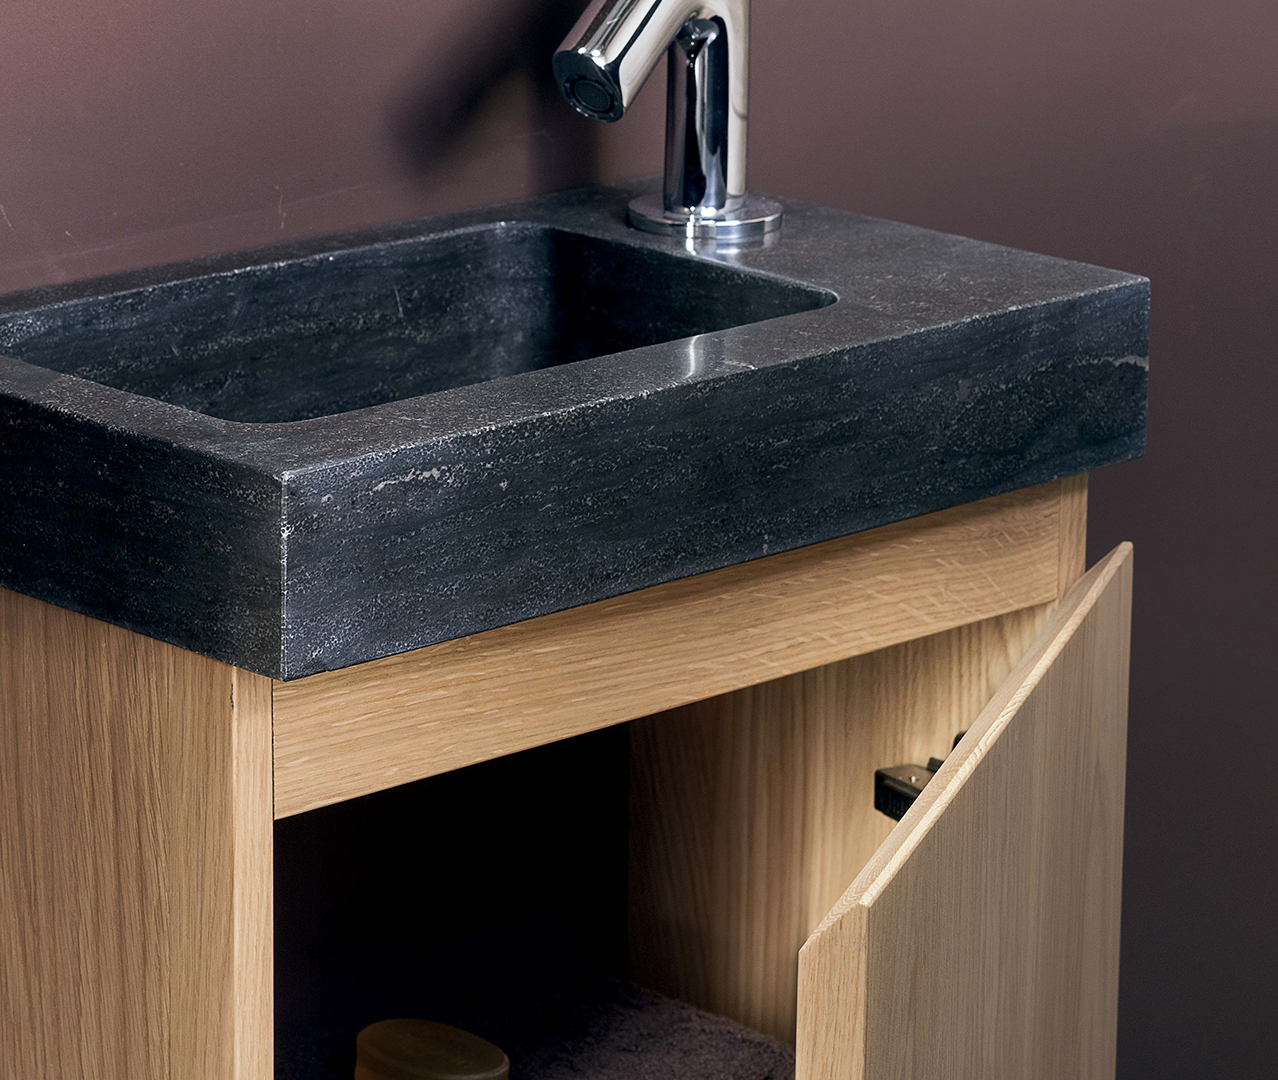 Gamme pop petit meuble de salle de bain sanijura - Meuble de salle de bain sanijura ...